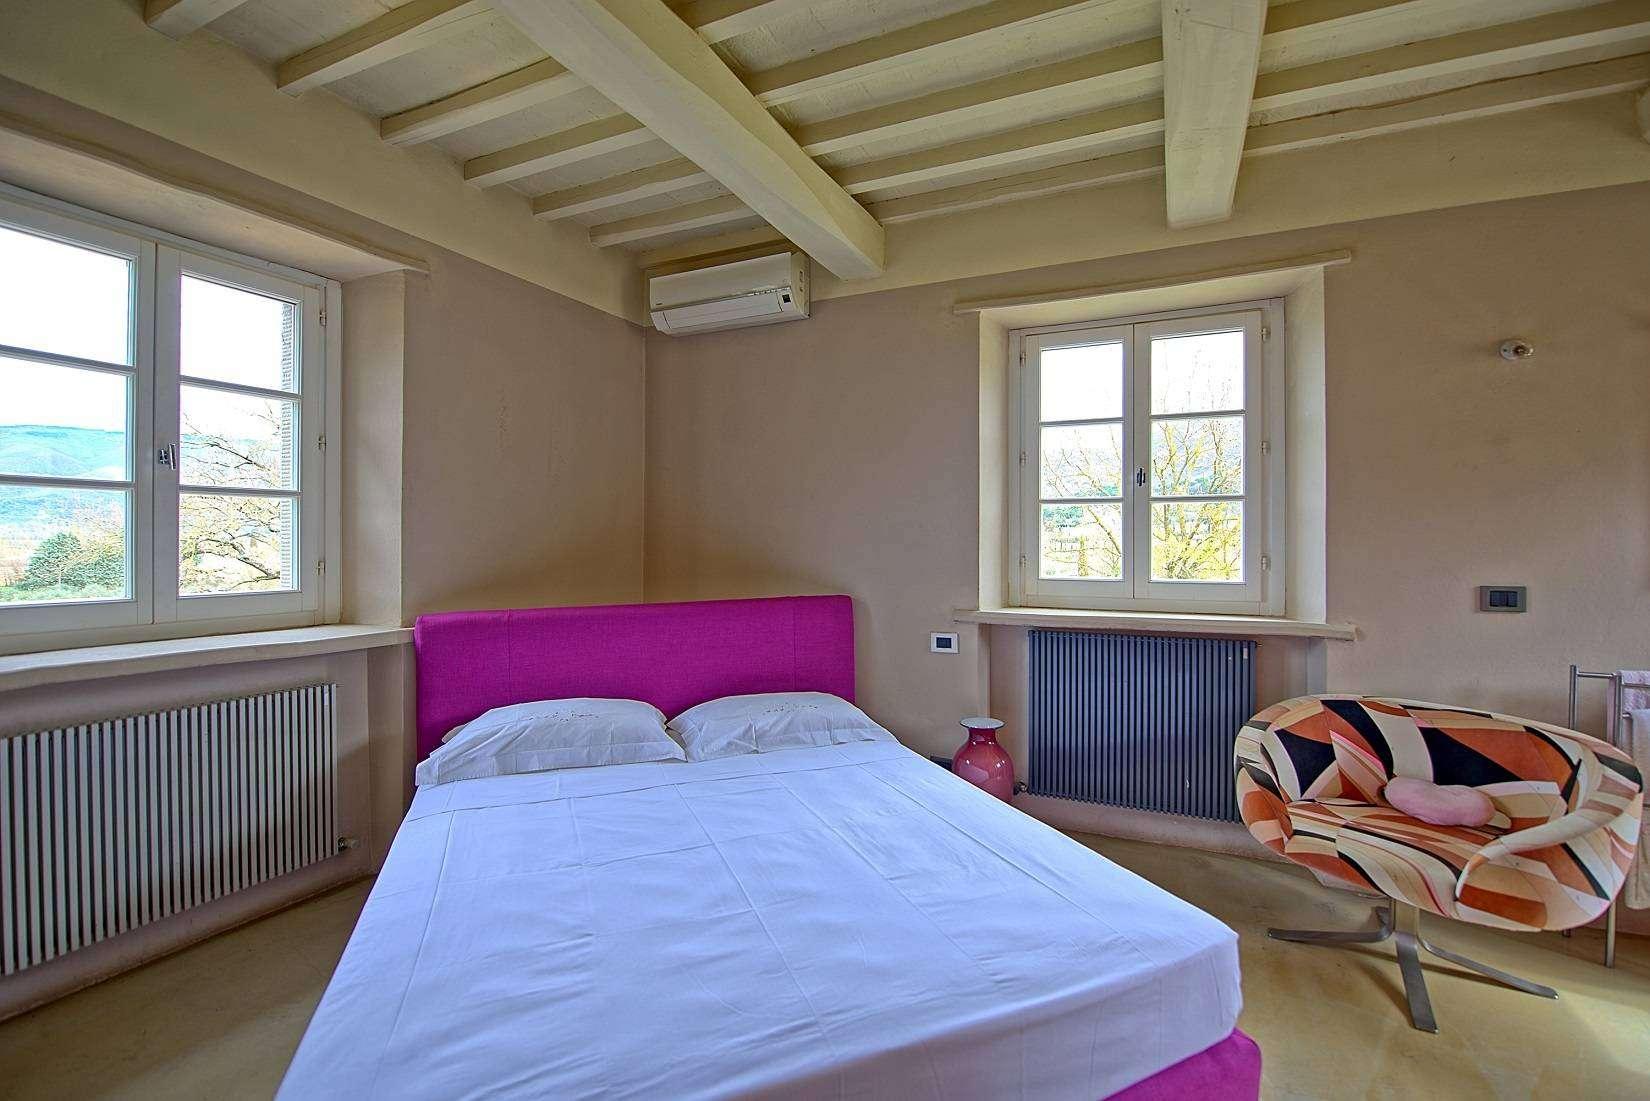 22 Jacopo Double bedroom